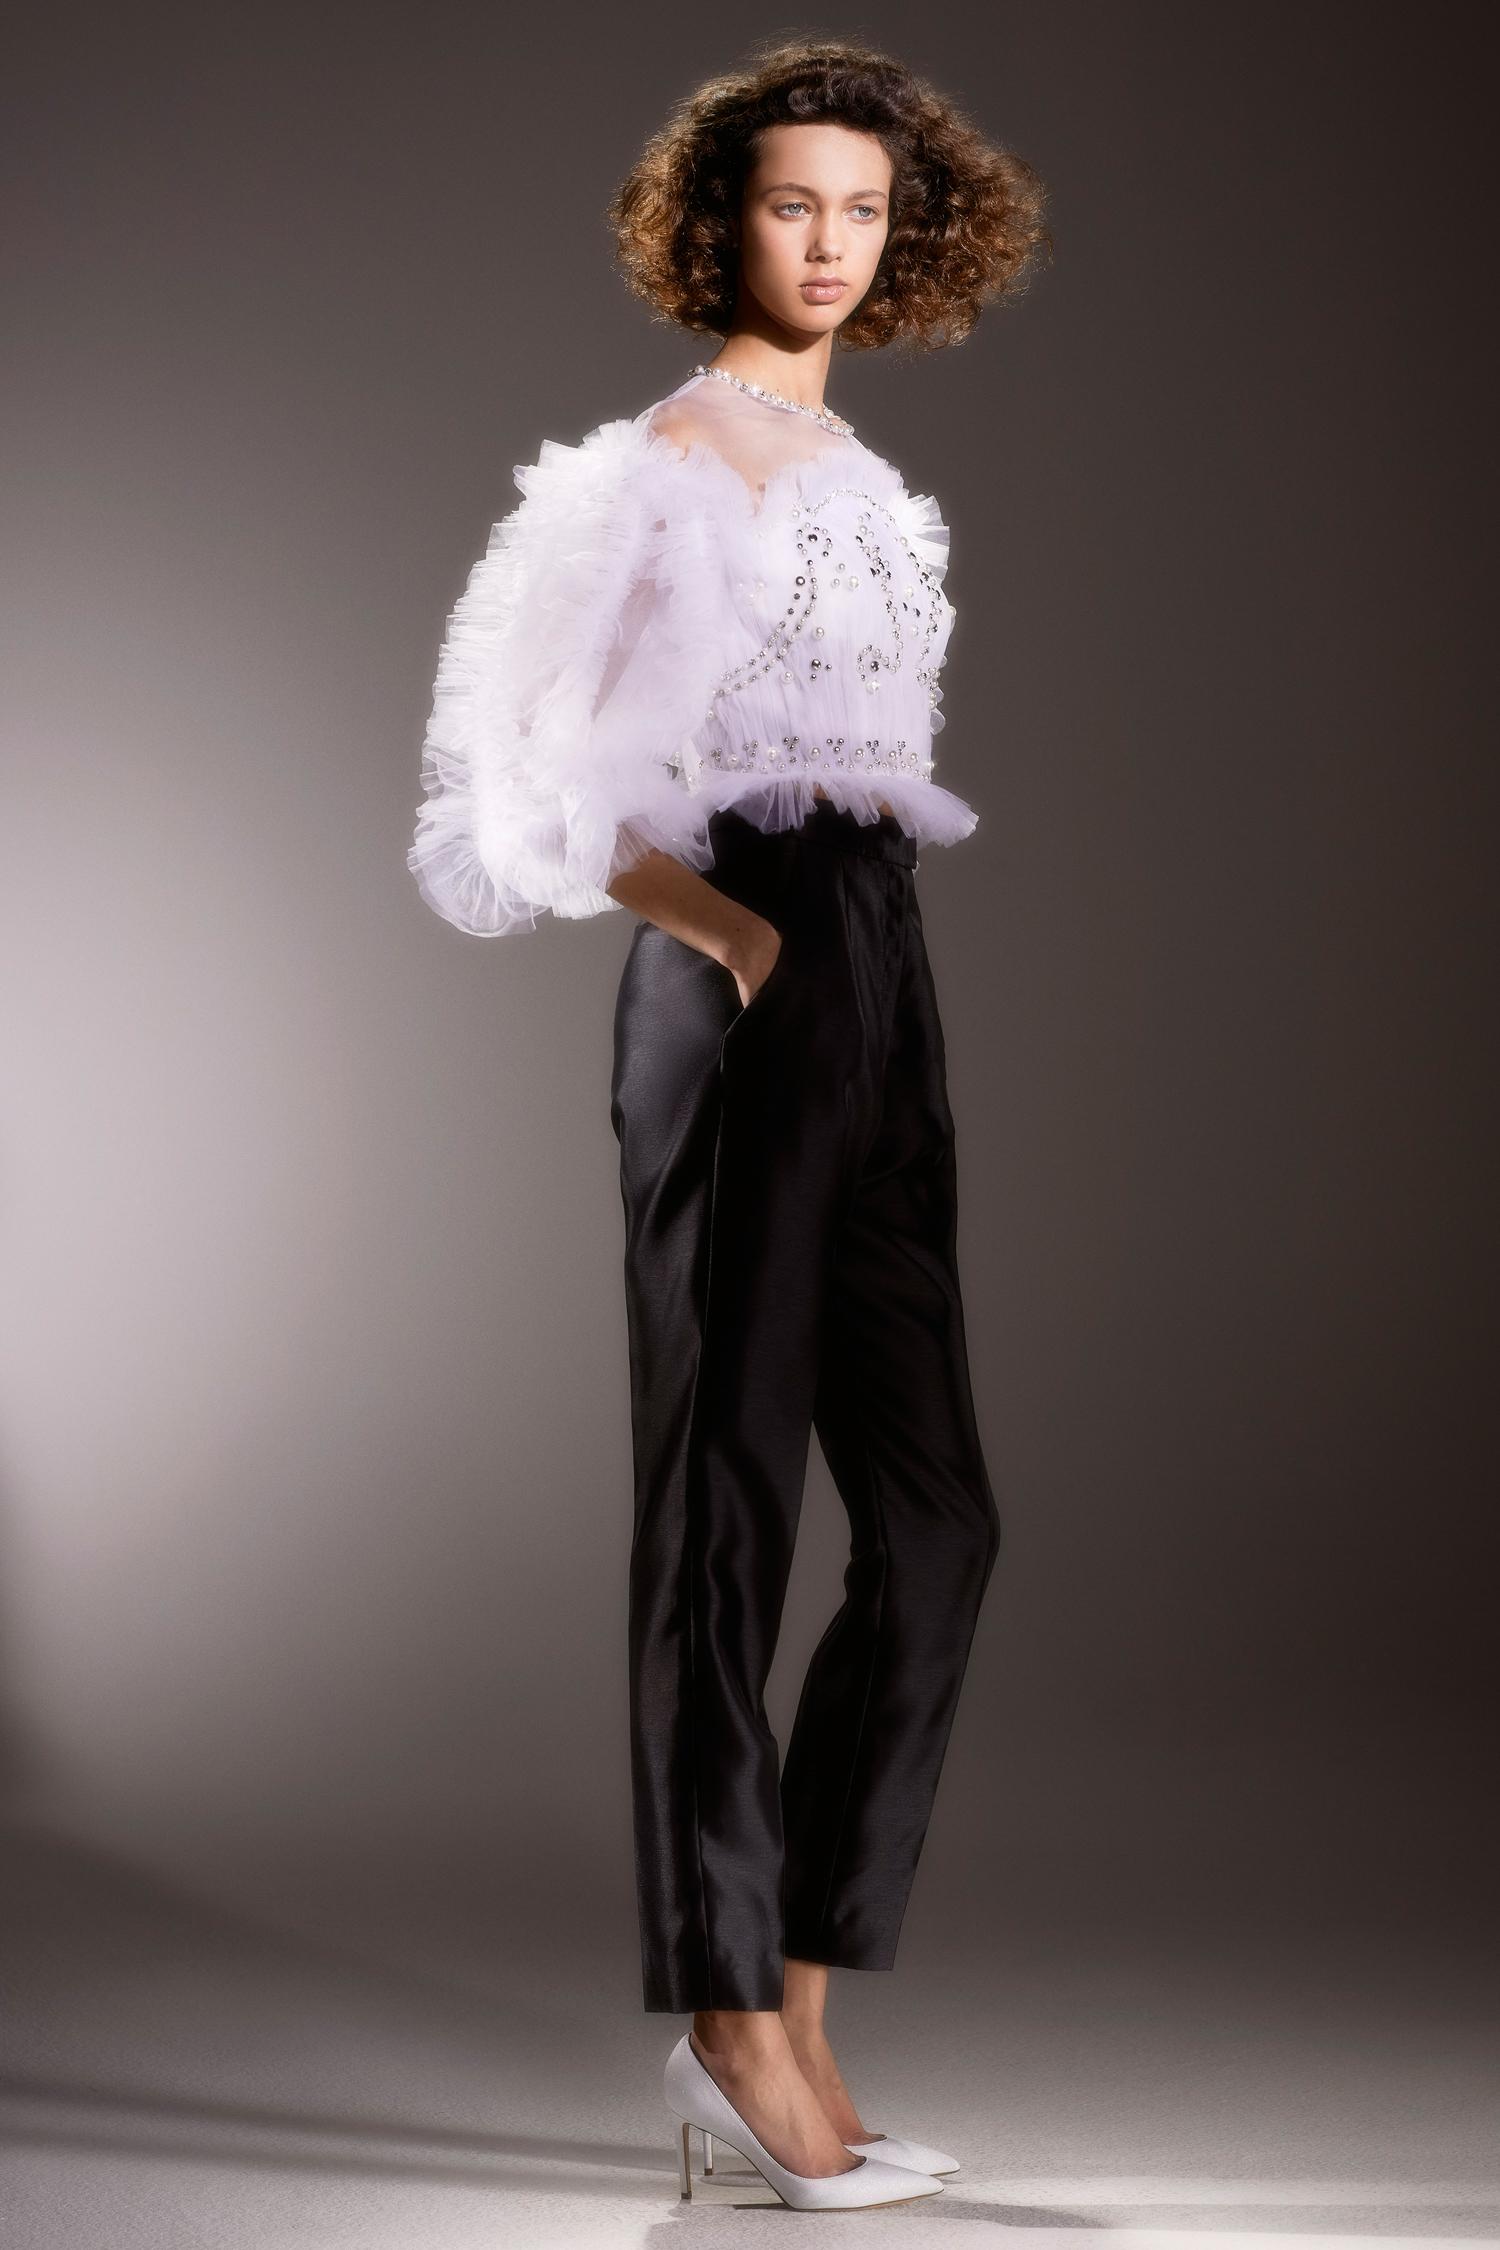 viktor and rolf beaded ruffled top and black pants wedding dress spring 2020